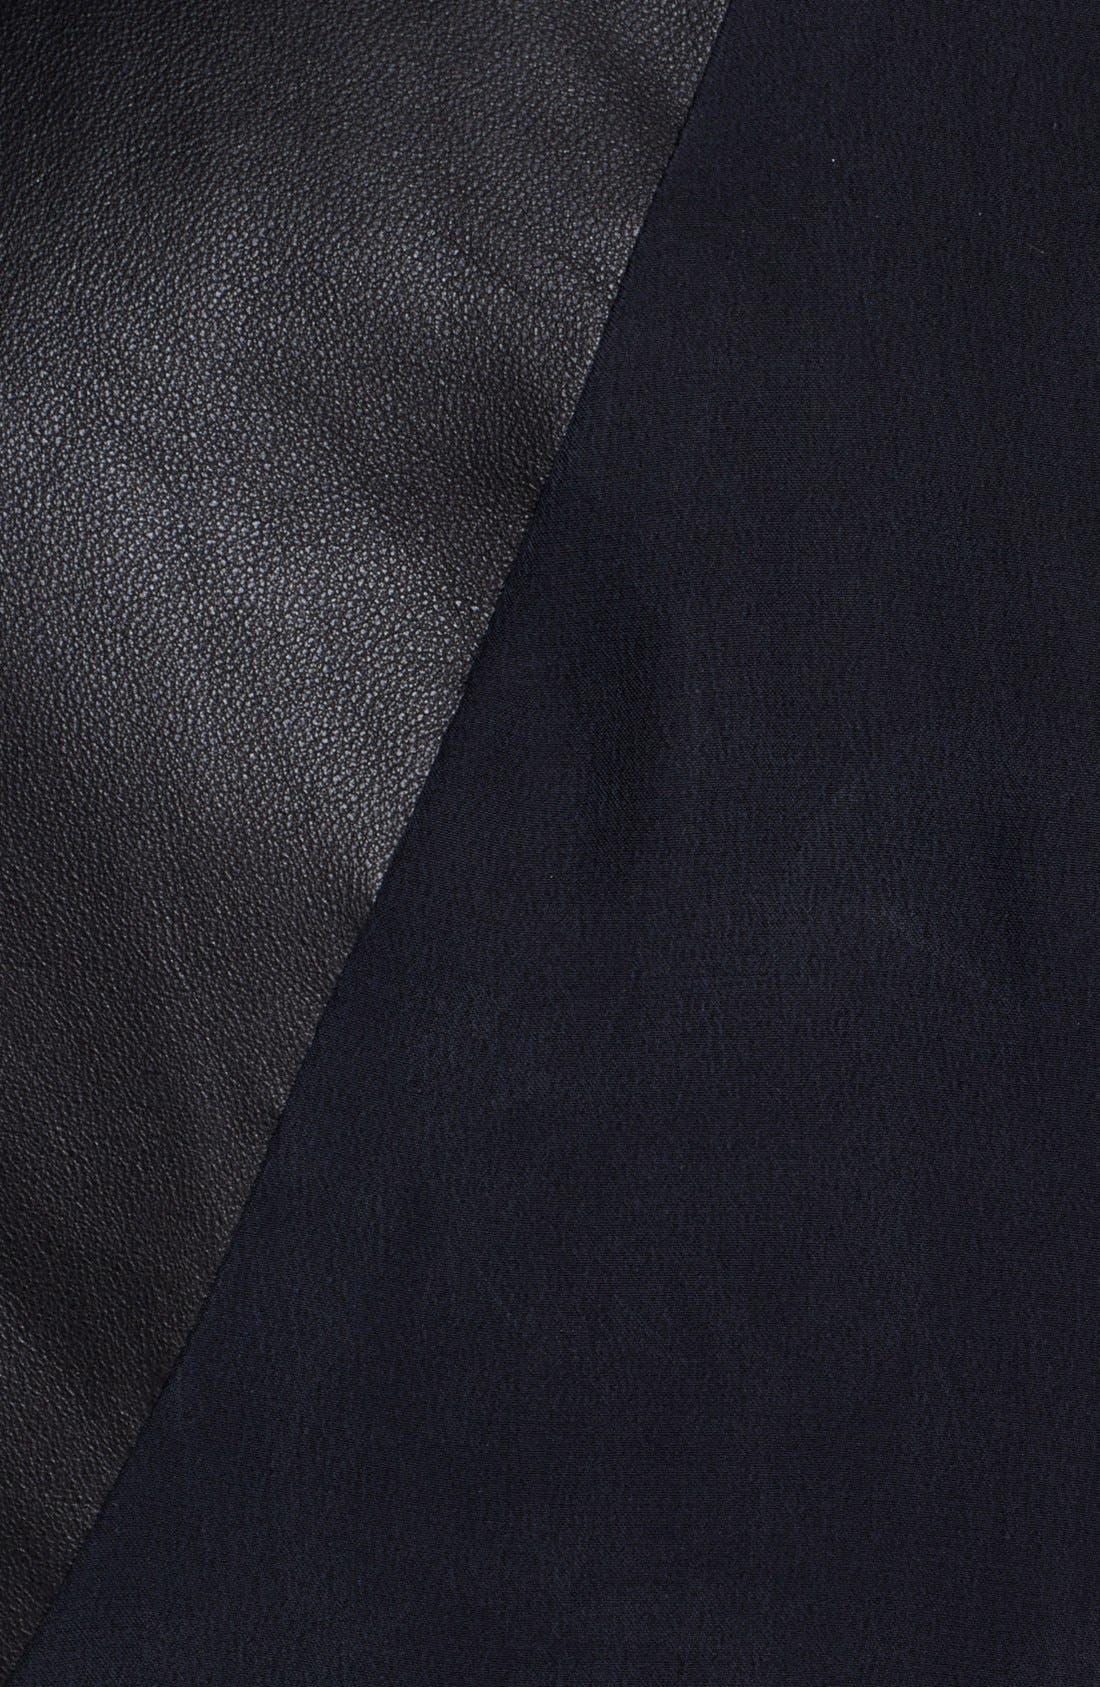 Alternate Image 3  - rag & bone 'Jade' Leather Trim Silk Tank (Nordstrom Exclusive)